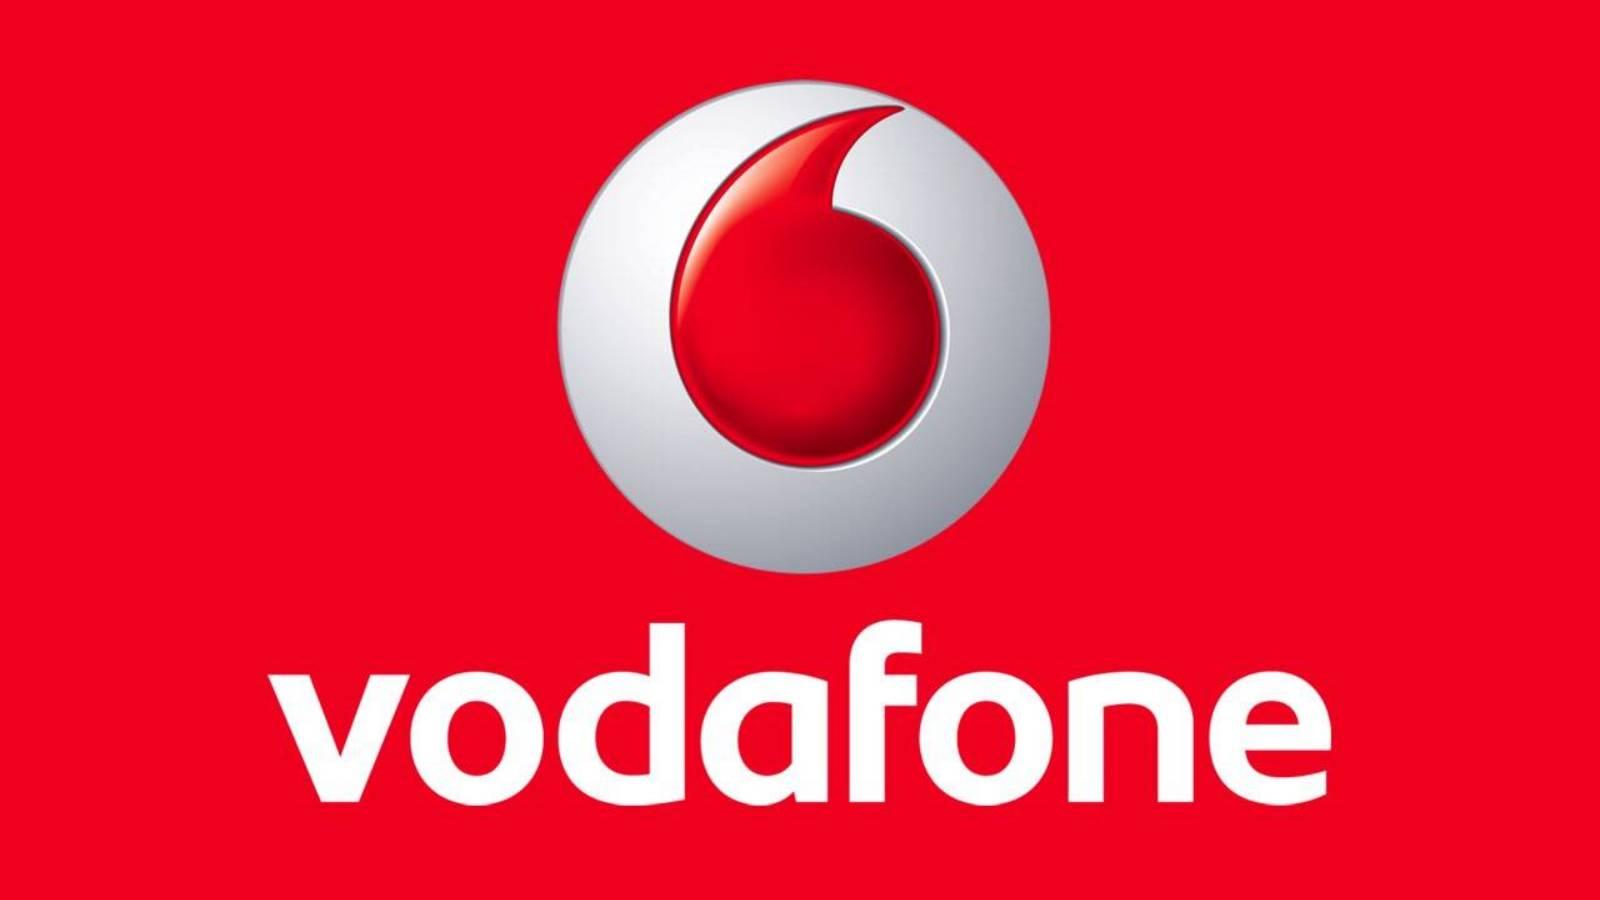 Vodafone viasat